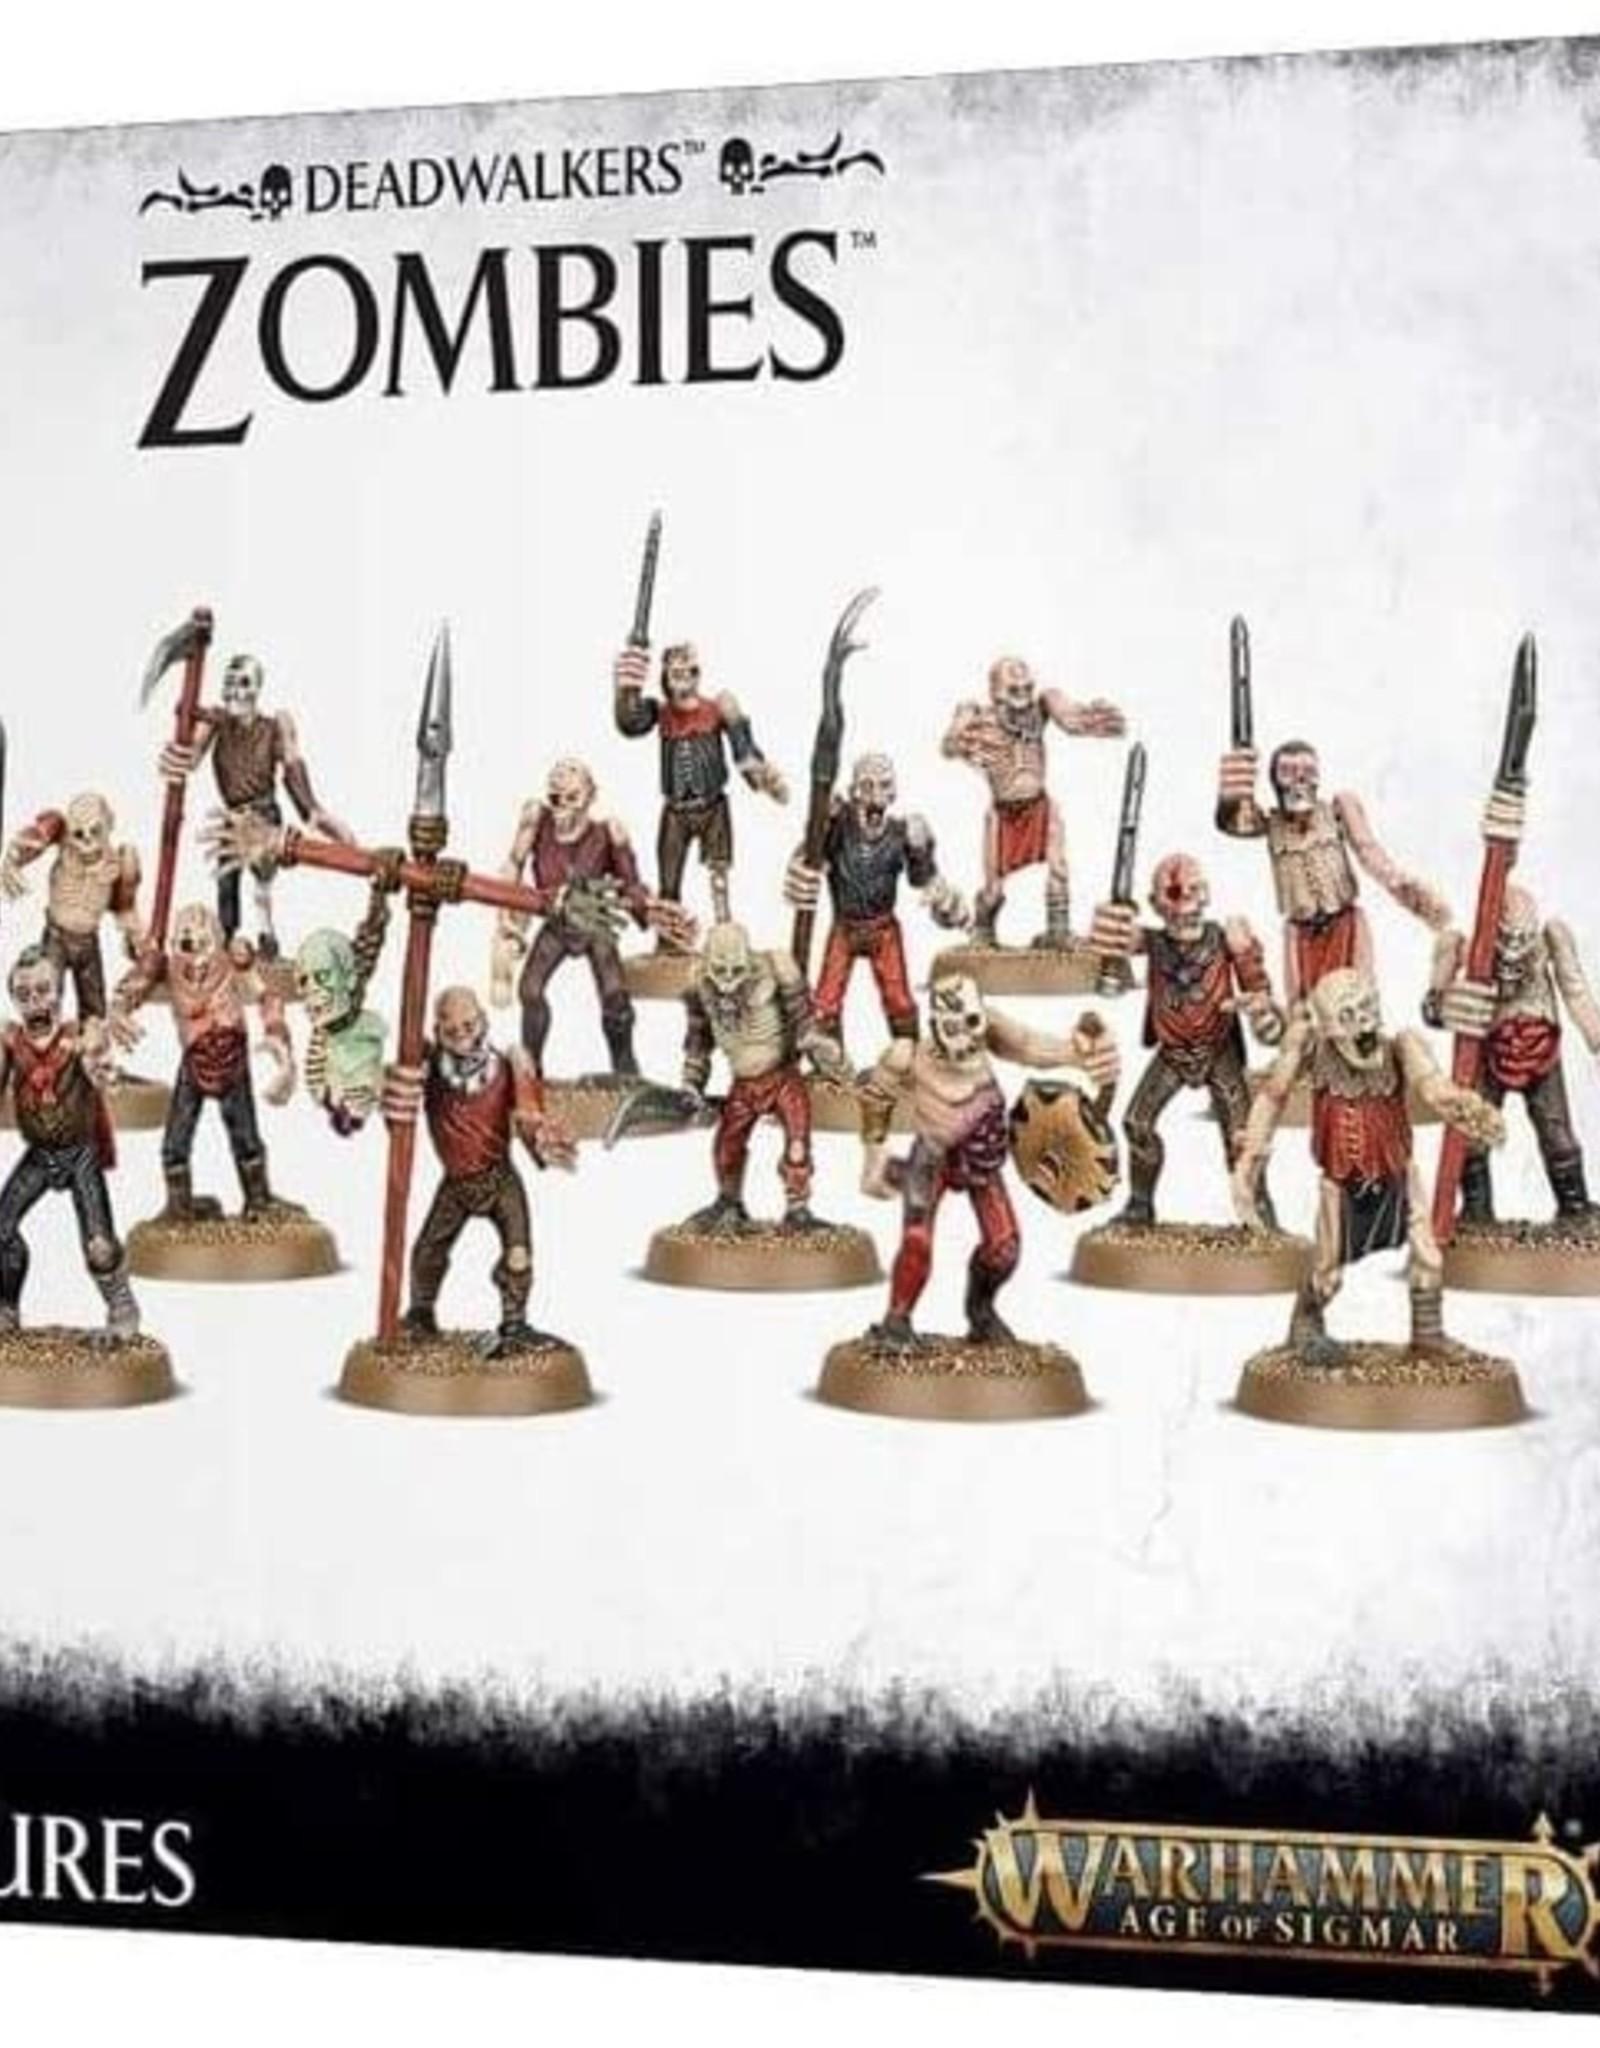 Games Workshop Deadwalkers Zombies